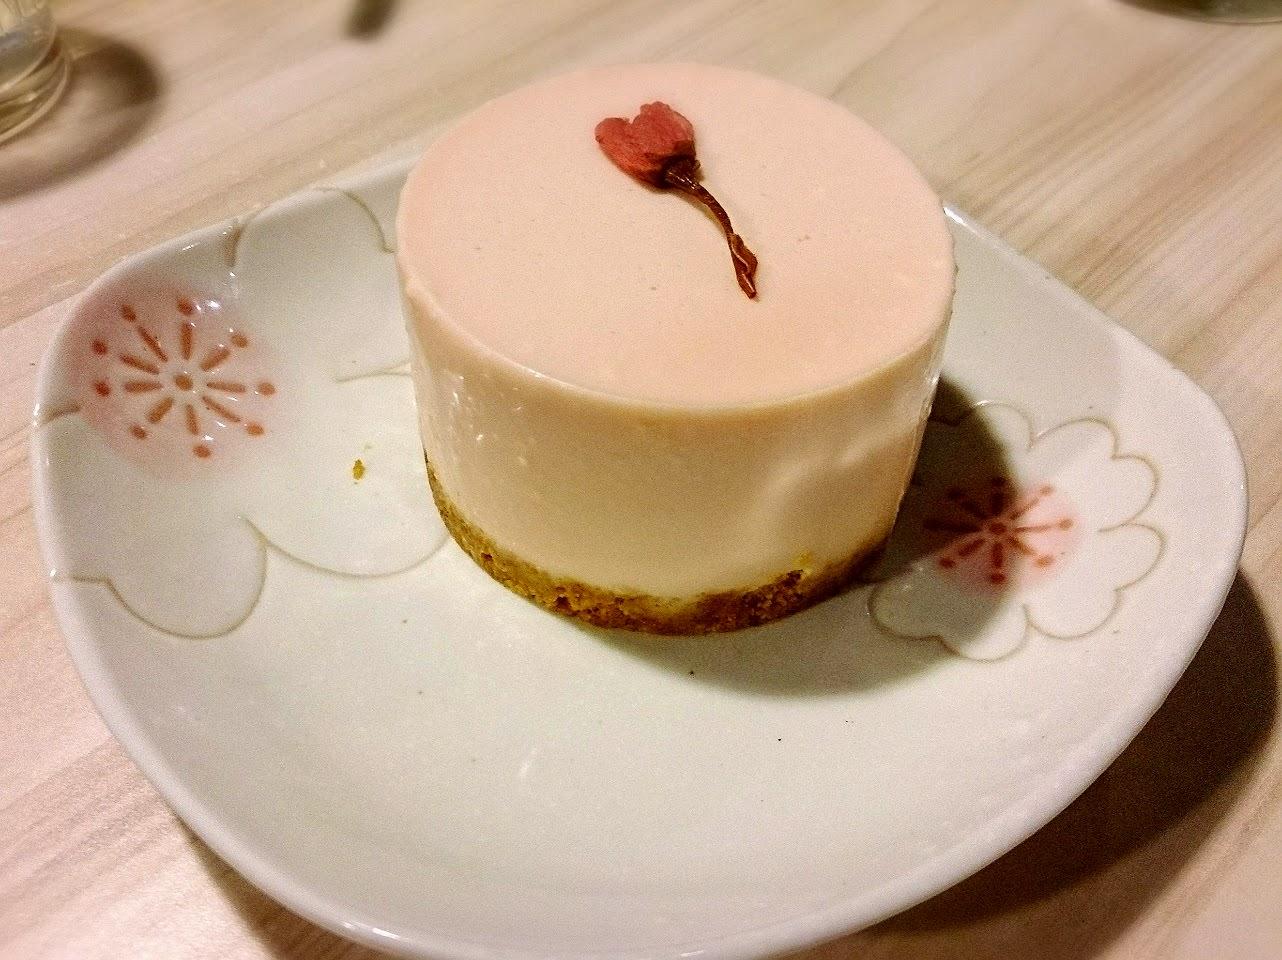 Machikaka WACAFÉ 抹茶控也瘋狂的甜點天堂-櫻花乳酪蛋糕